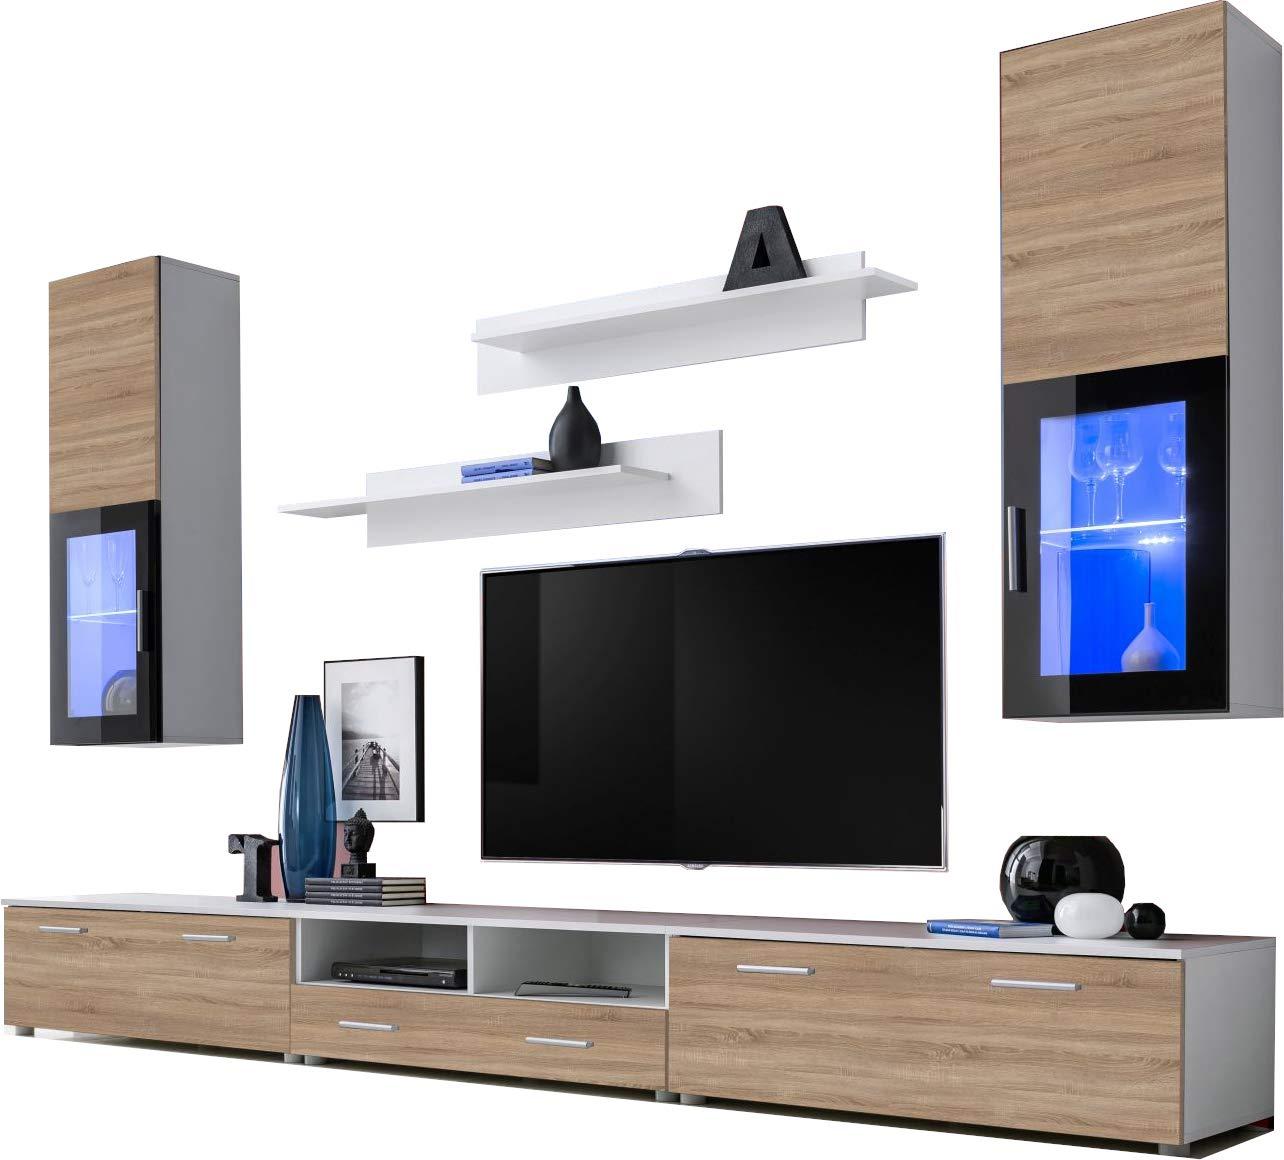 ExtremeFurniture Lincoln Mueble para TV, Carcasa en Negro Mate/Frente en Roble Sonoma Mate + LED Azul: Amazon.es: Hogar